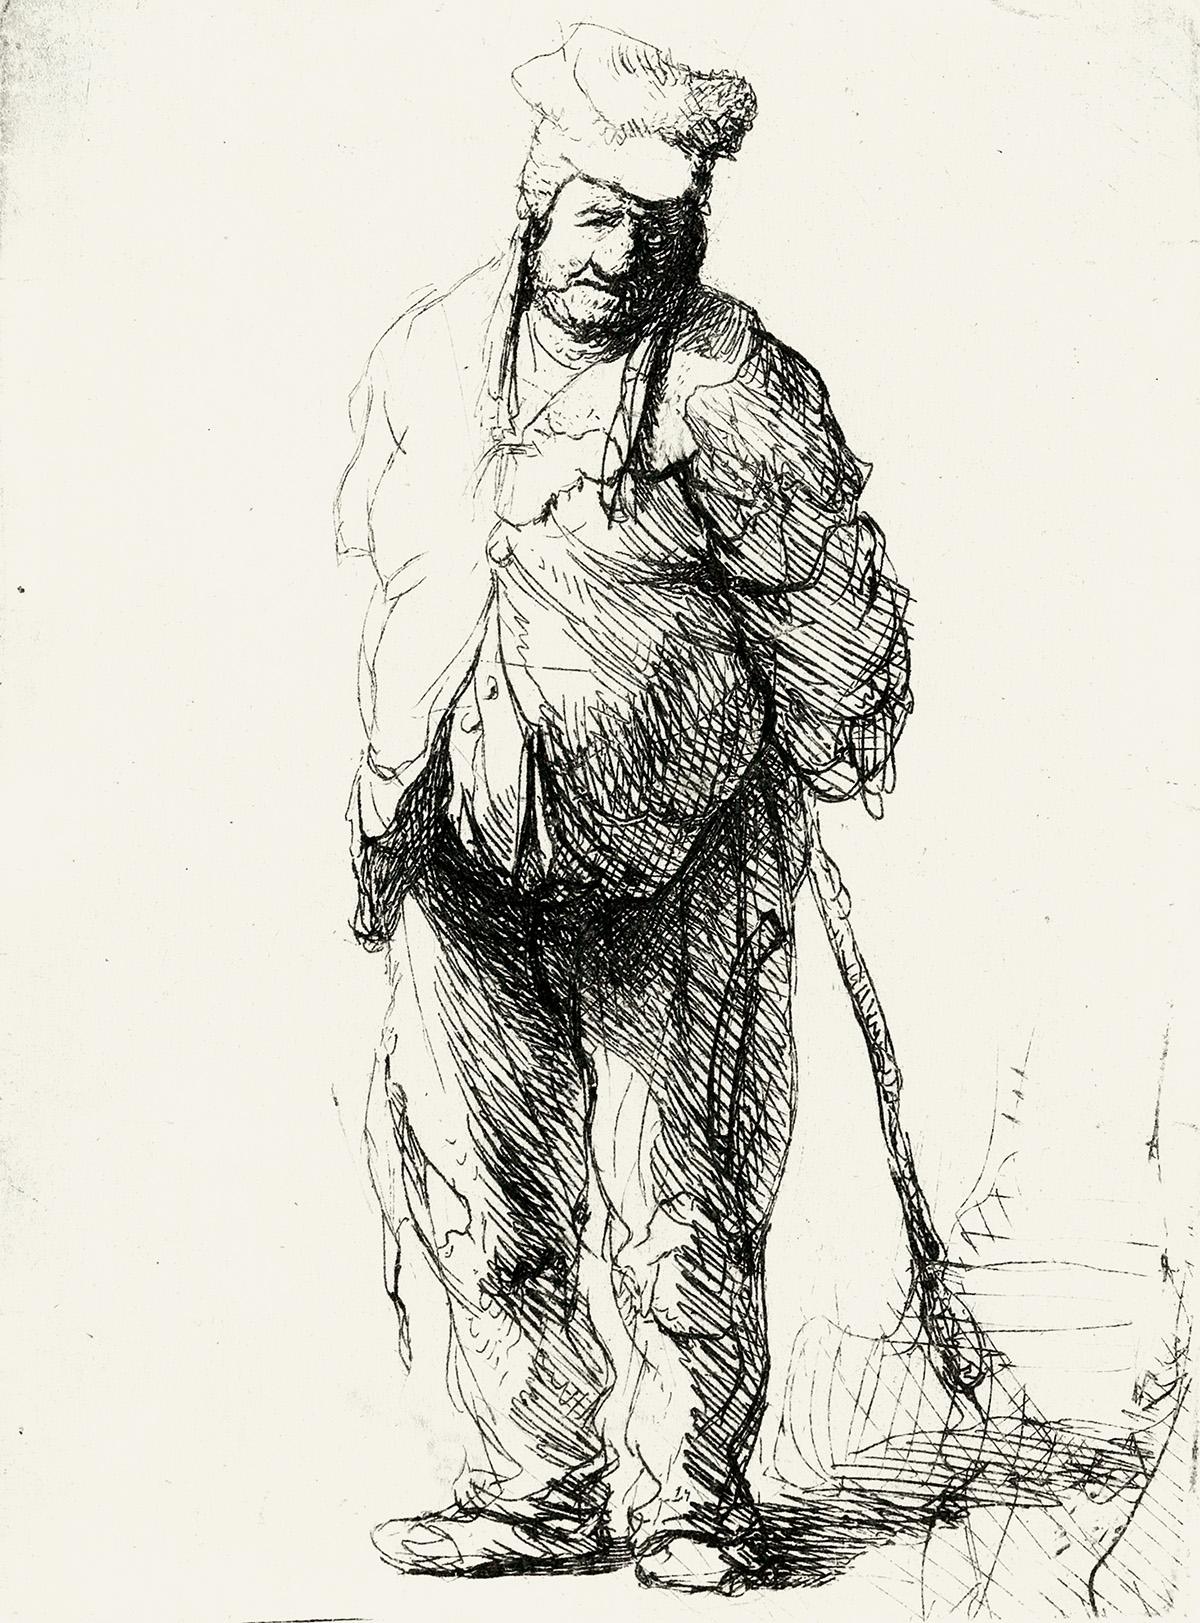 REMBRANDT-VAN-RIJN-A-Ragged-Peasant-with-his-Hands-Behind-Hi